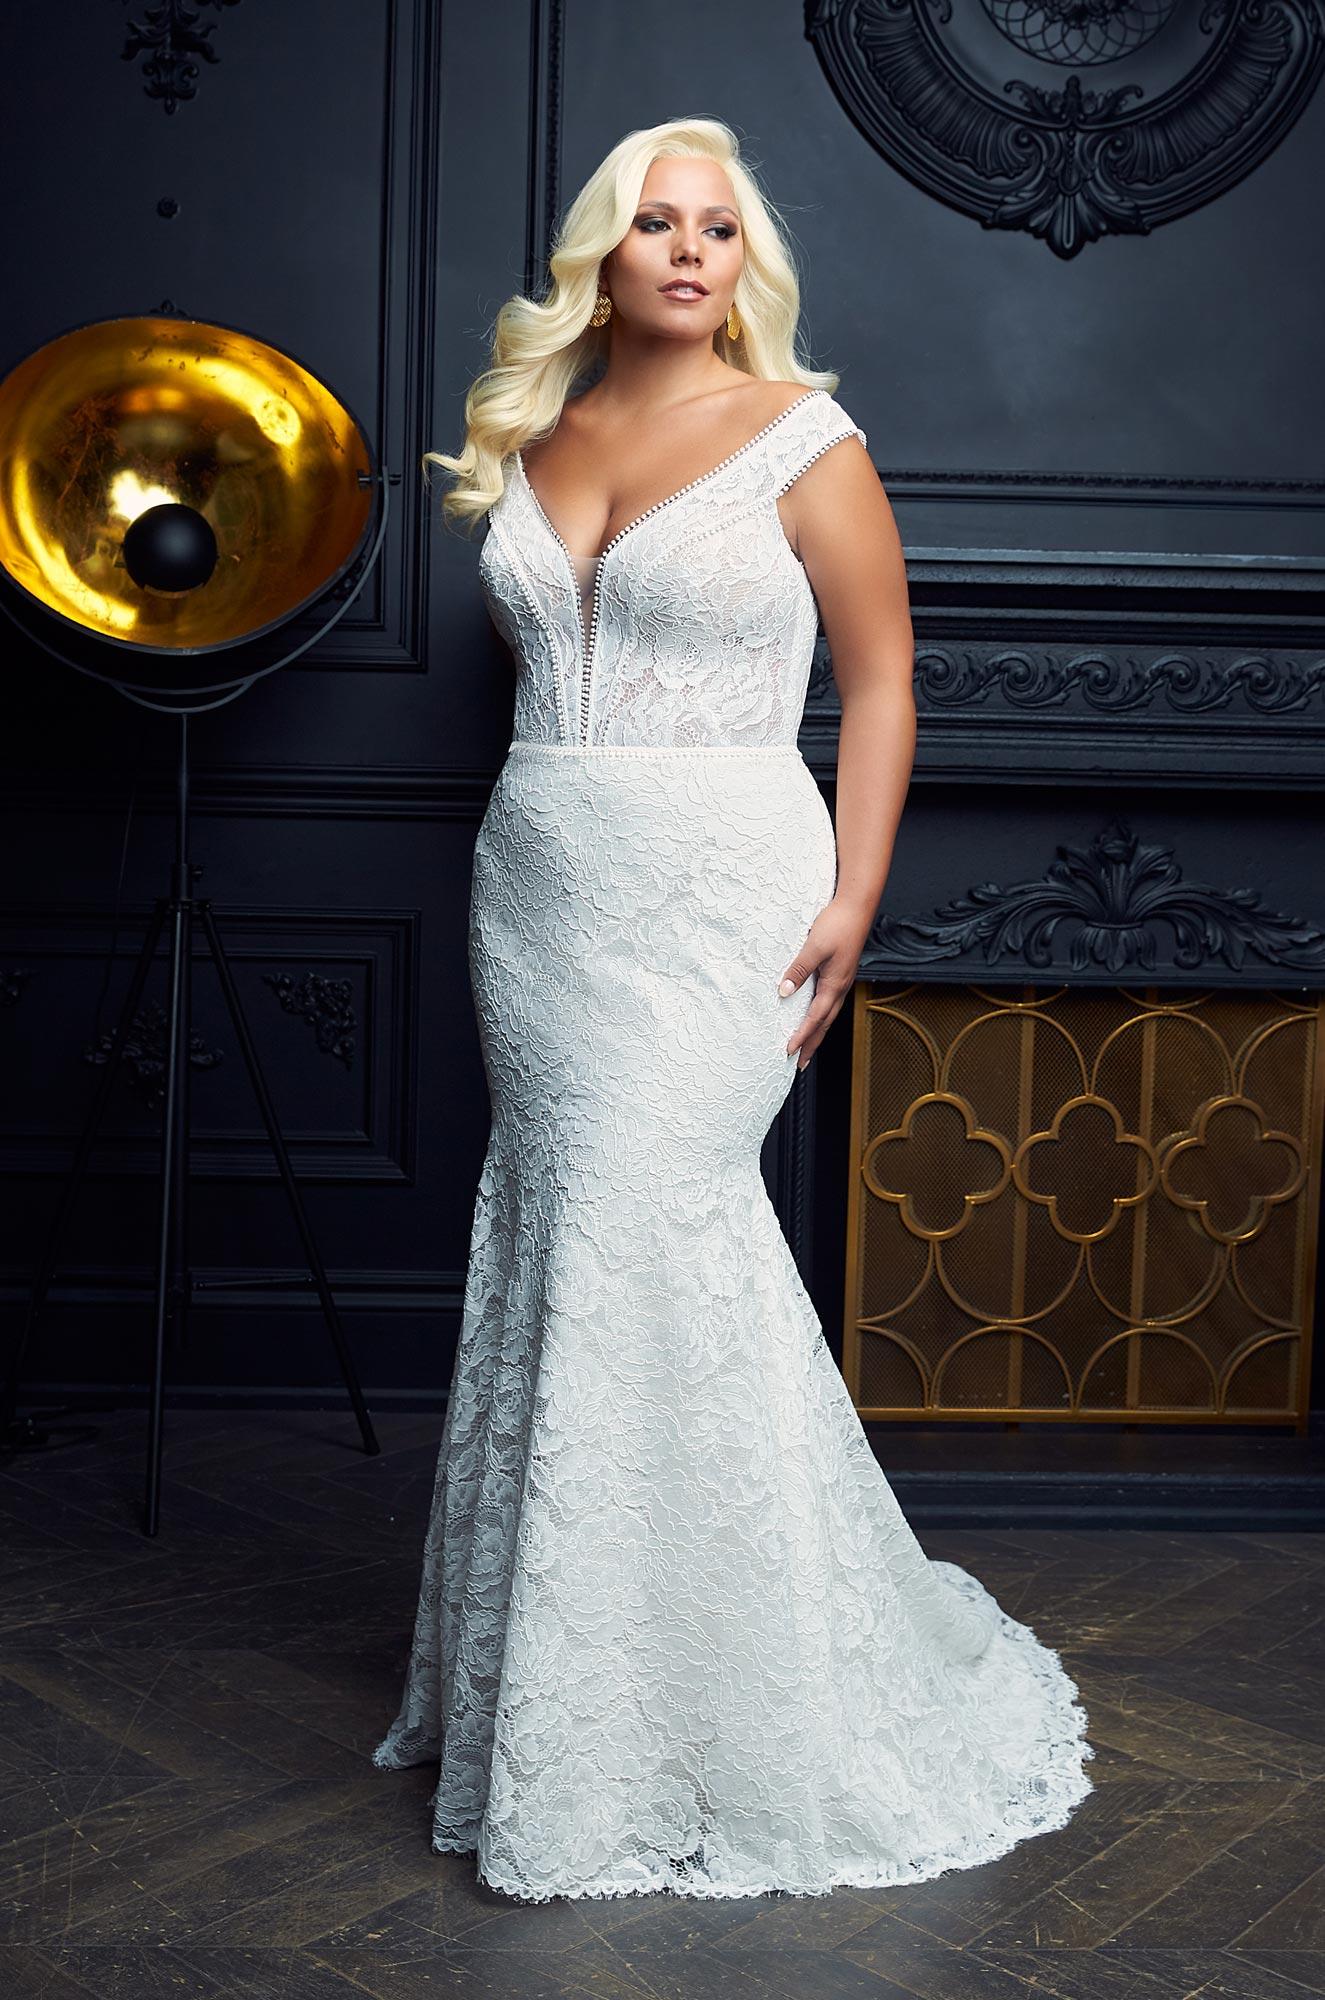 Stunning Lace Trim Wedding Dress - Style #4976 | Paloma Blanca